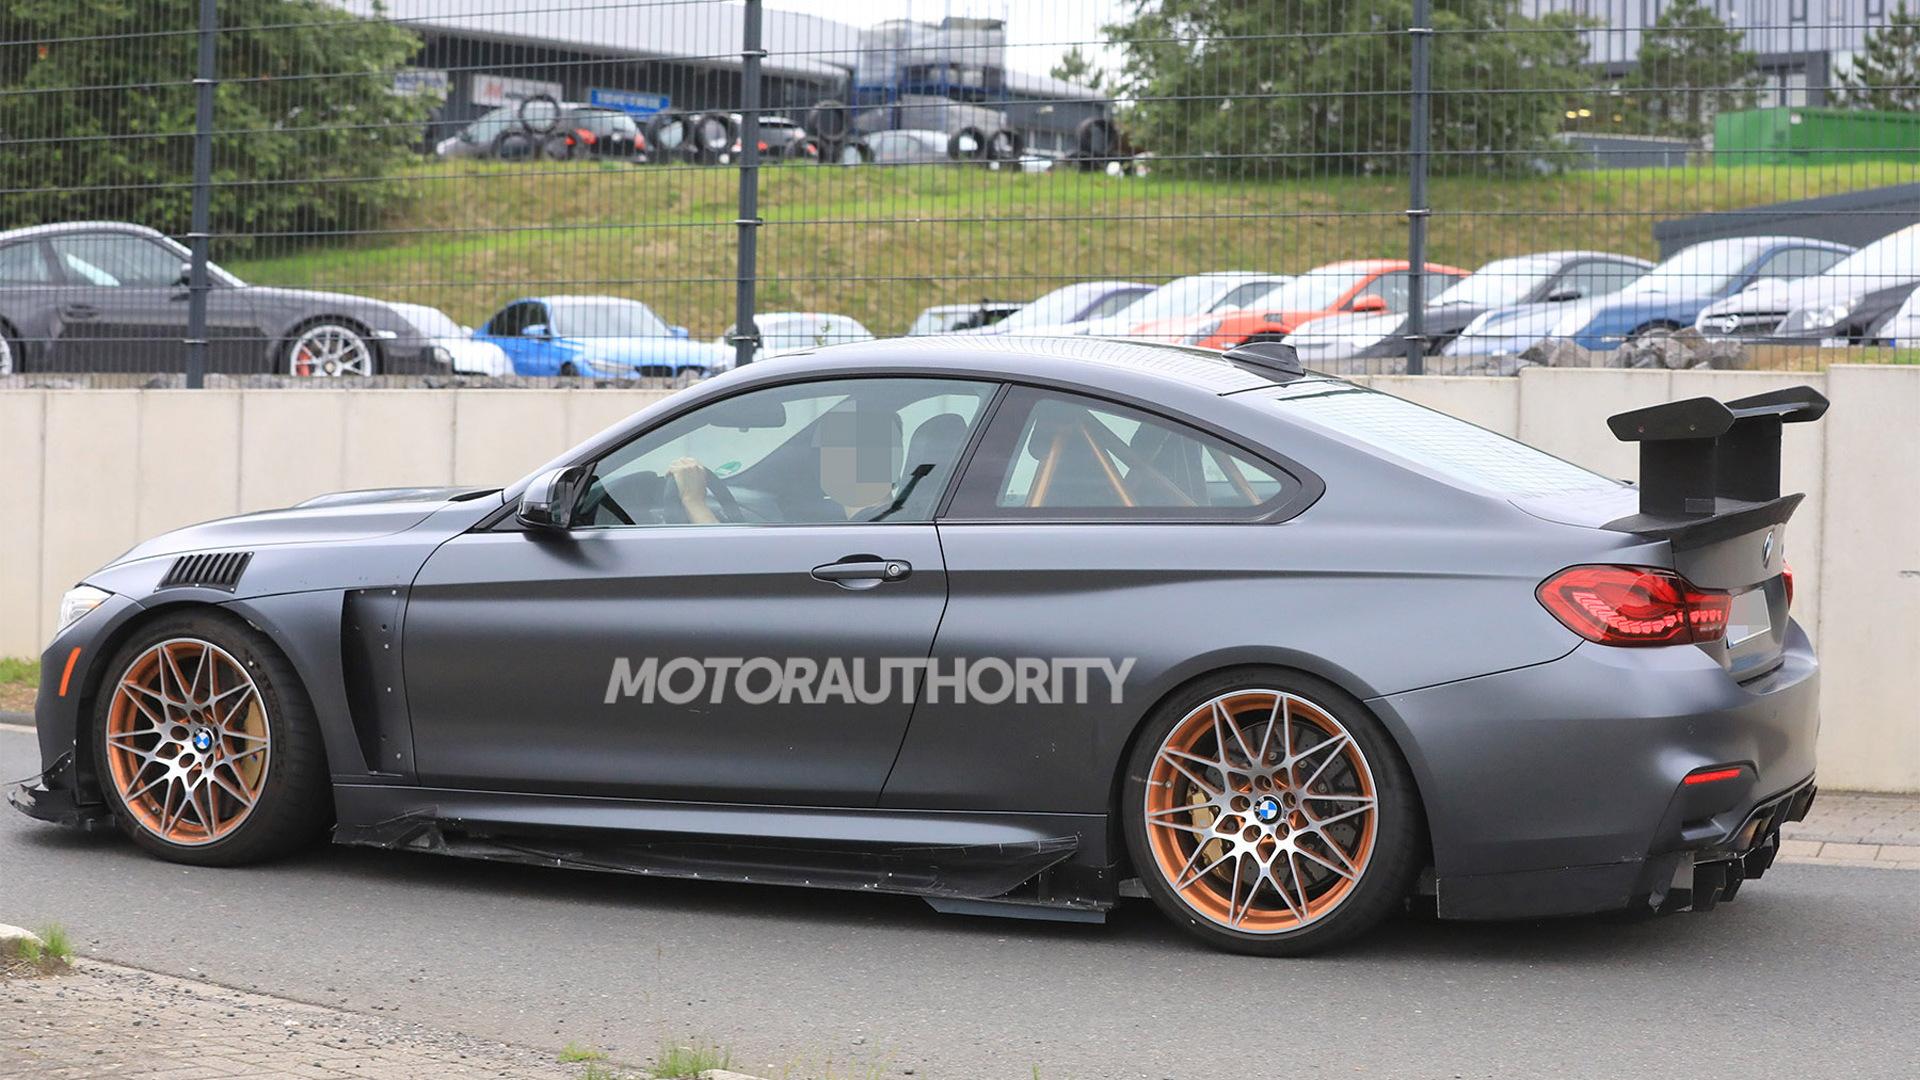 Mystery BMW M4 GTS spy shots - Image via S. Baldauf/SB-Medien